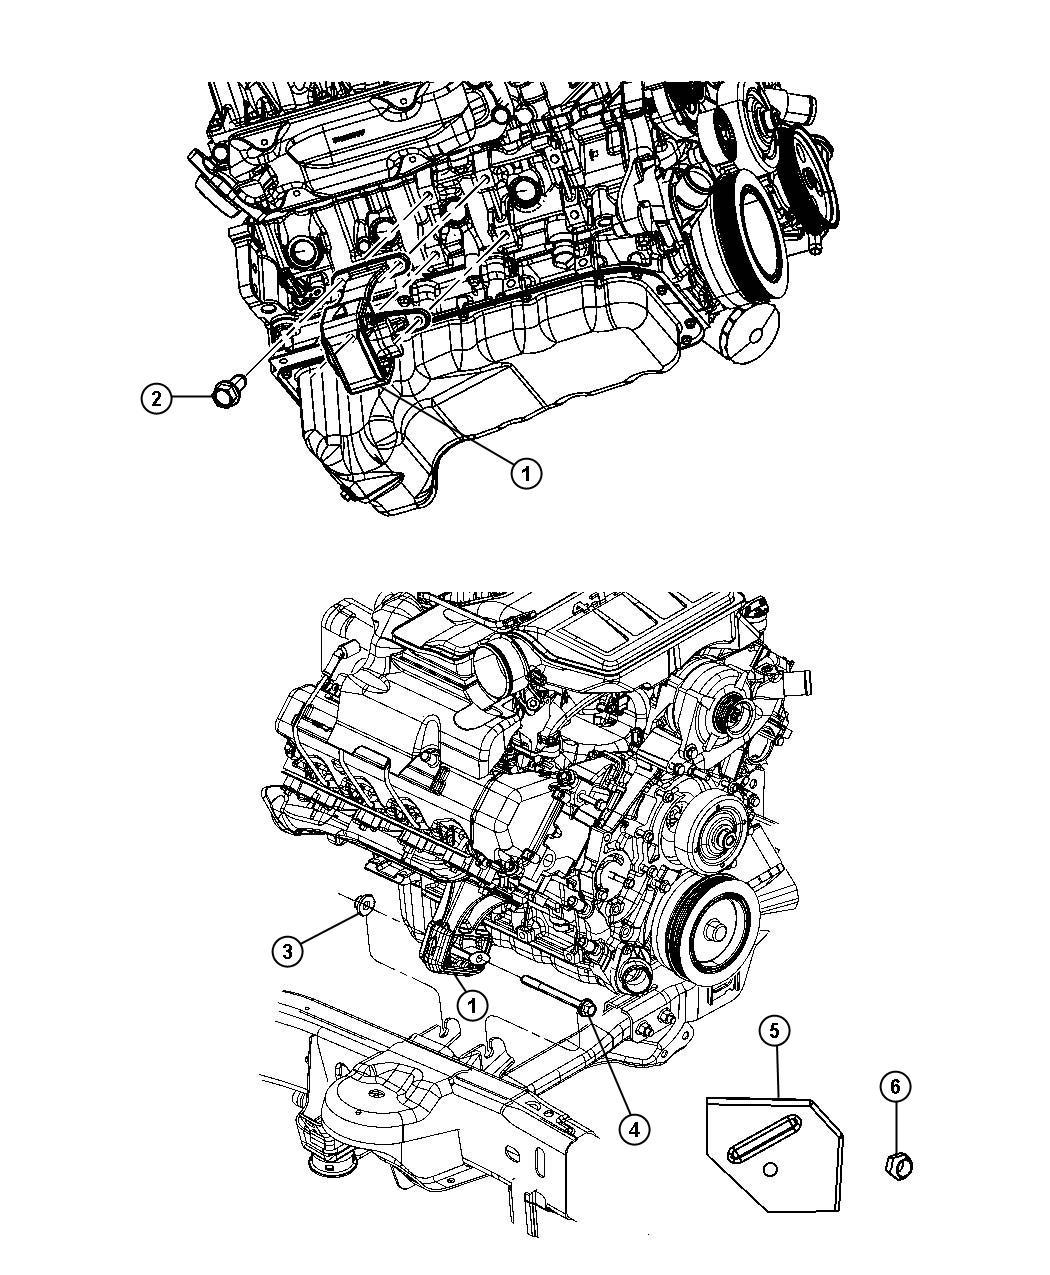 Dodge Ram Heat Shield Shield Engine Mount Left